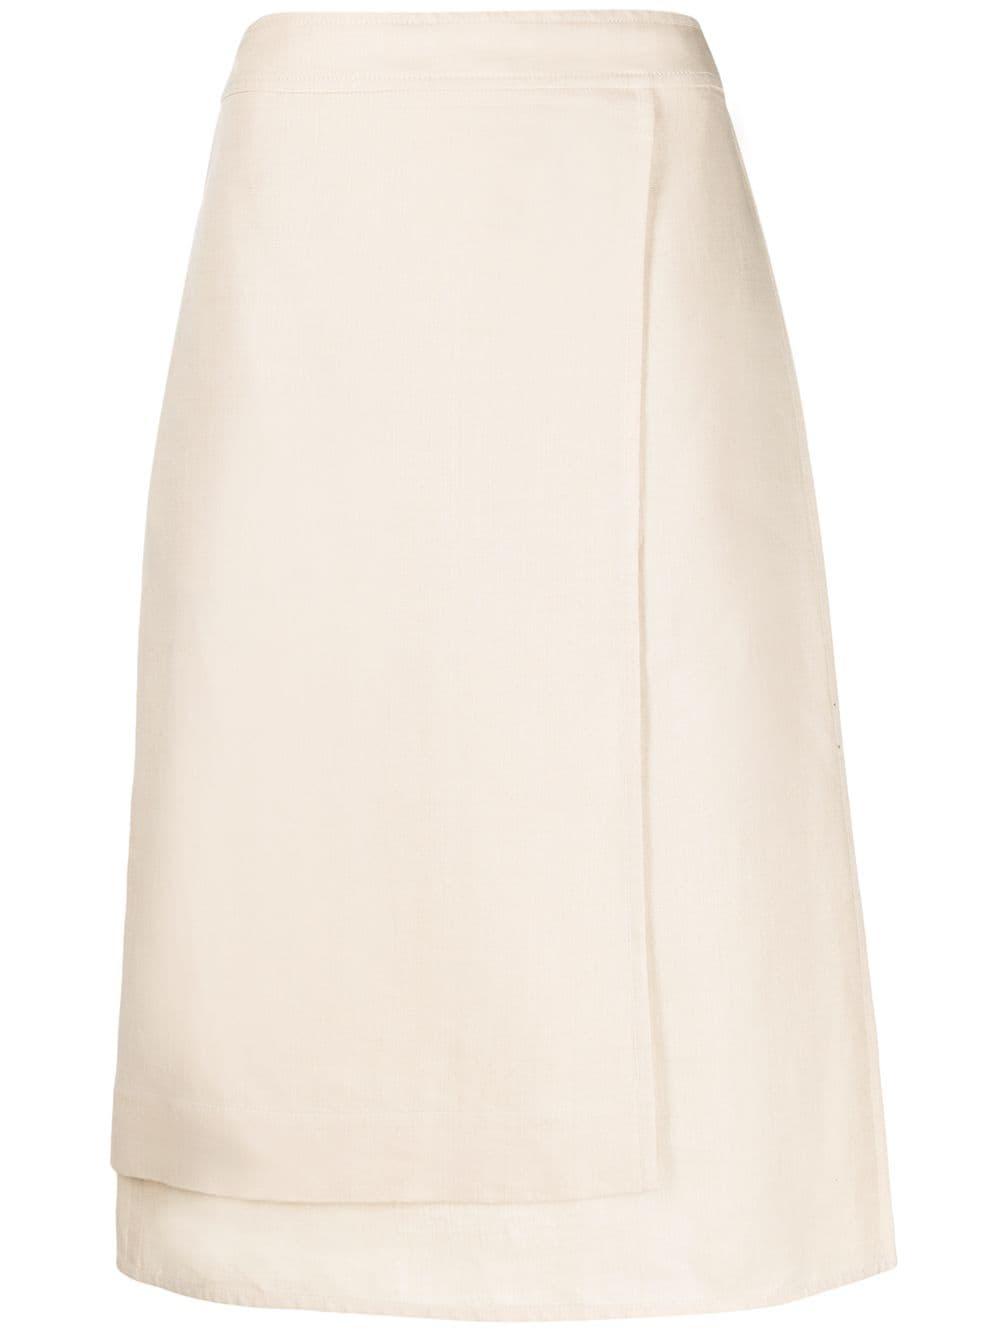 Jil Sander многослойная юбка-карандаш